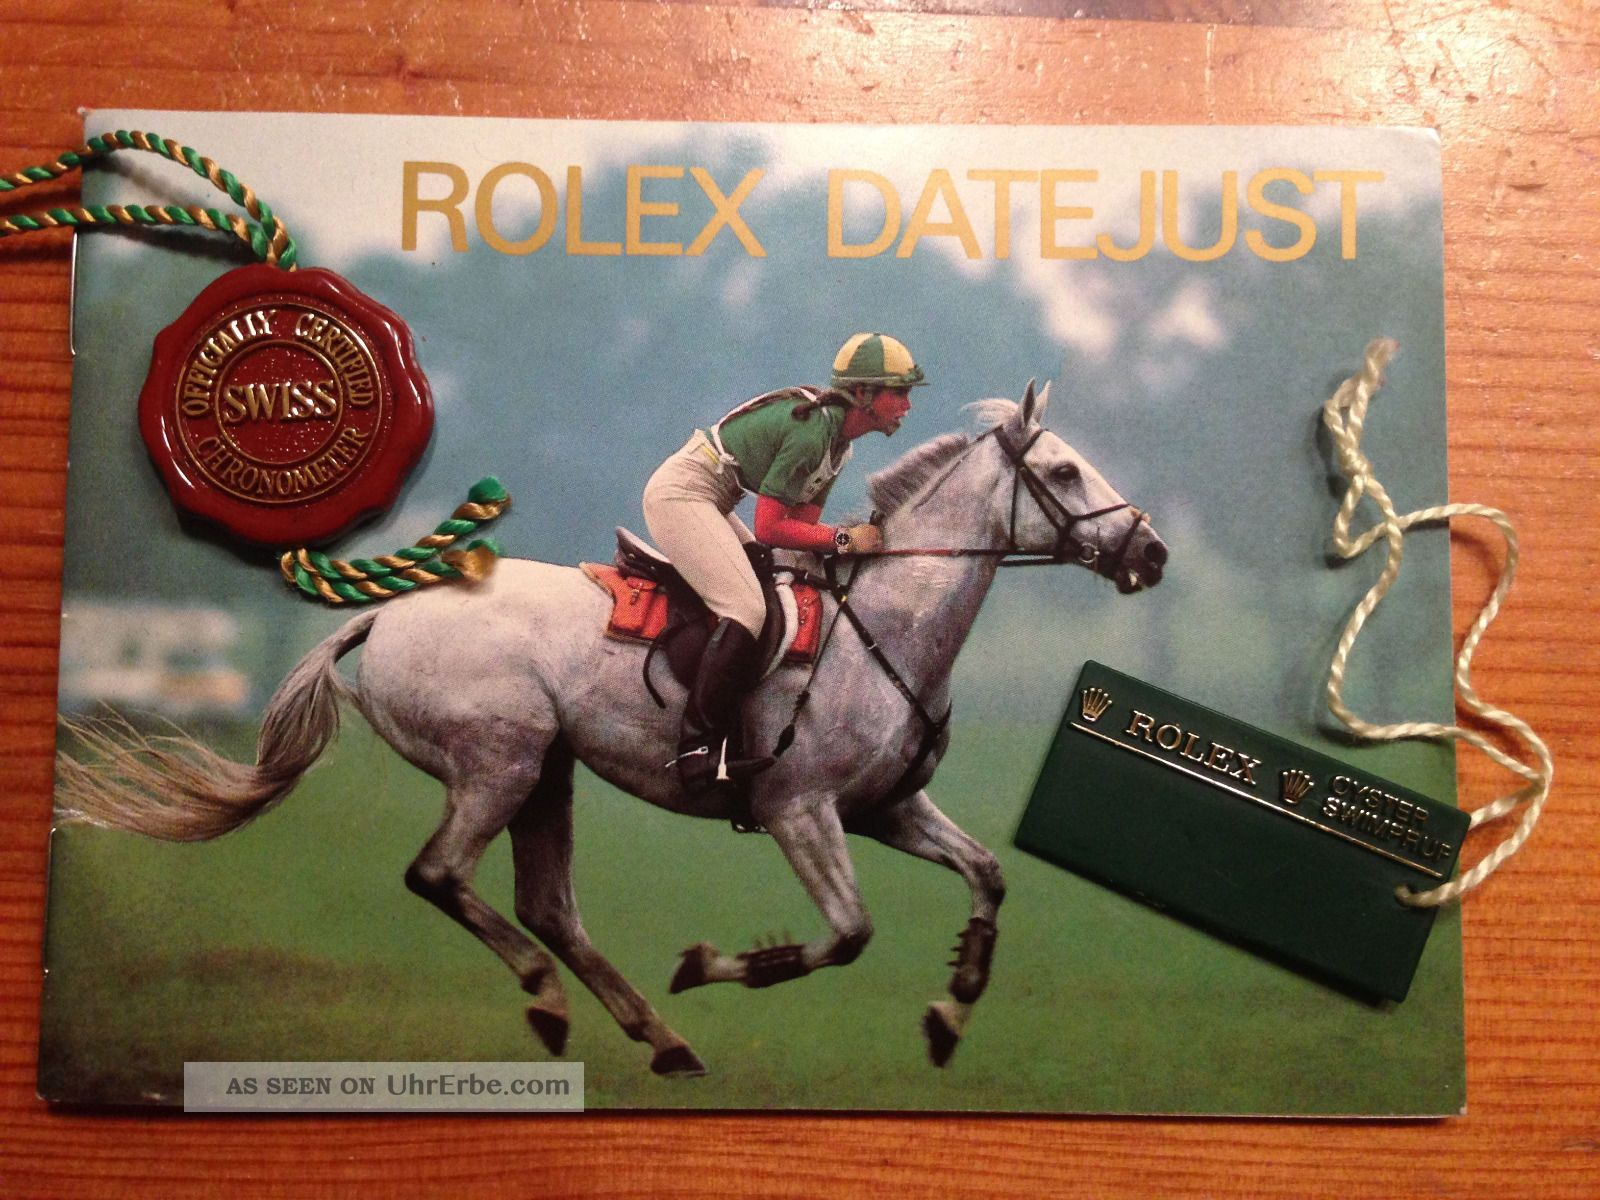 Rolex Datejust Booklet Das Klassische Mit Hangtag Armbanduhren Bild